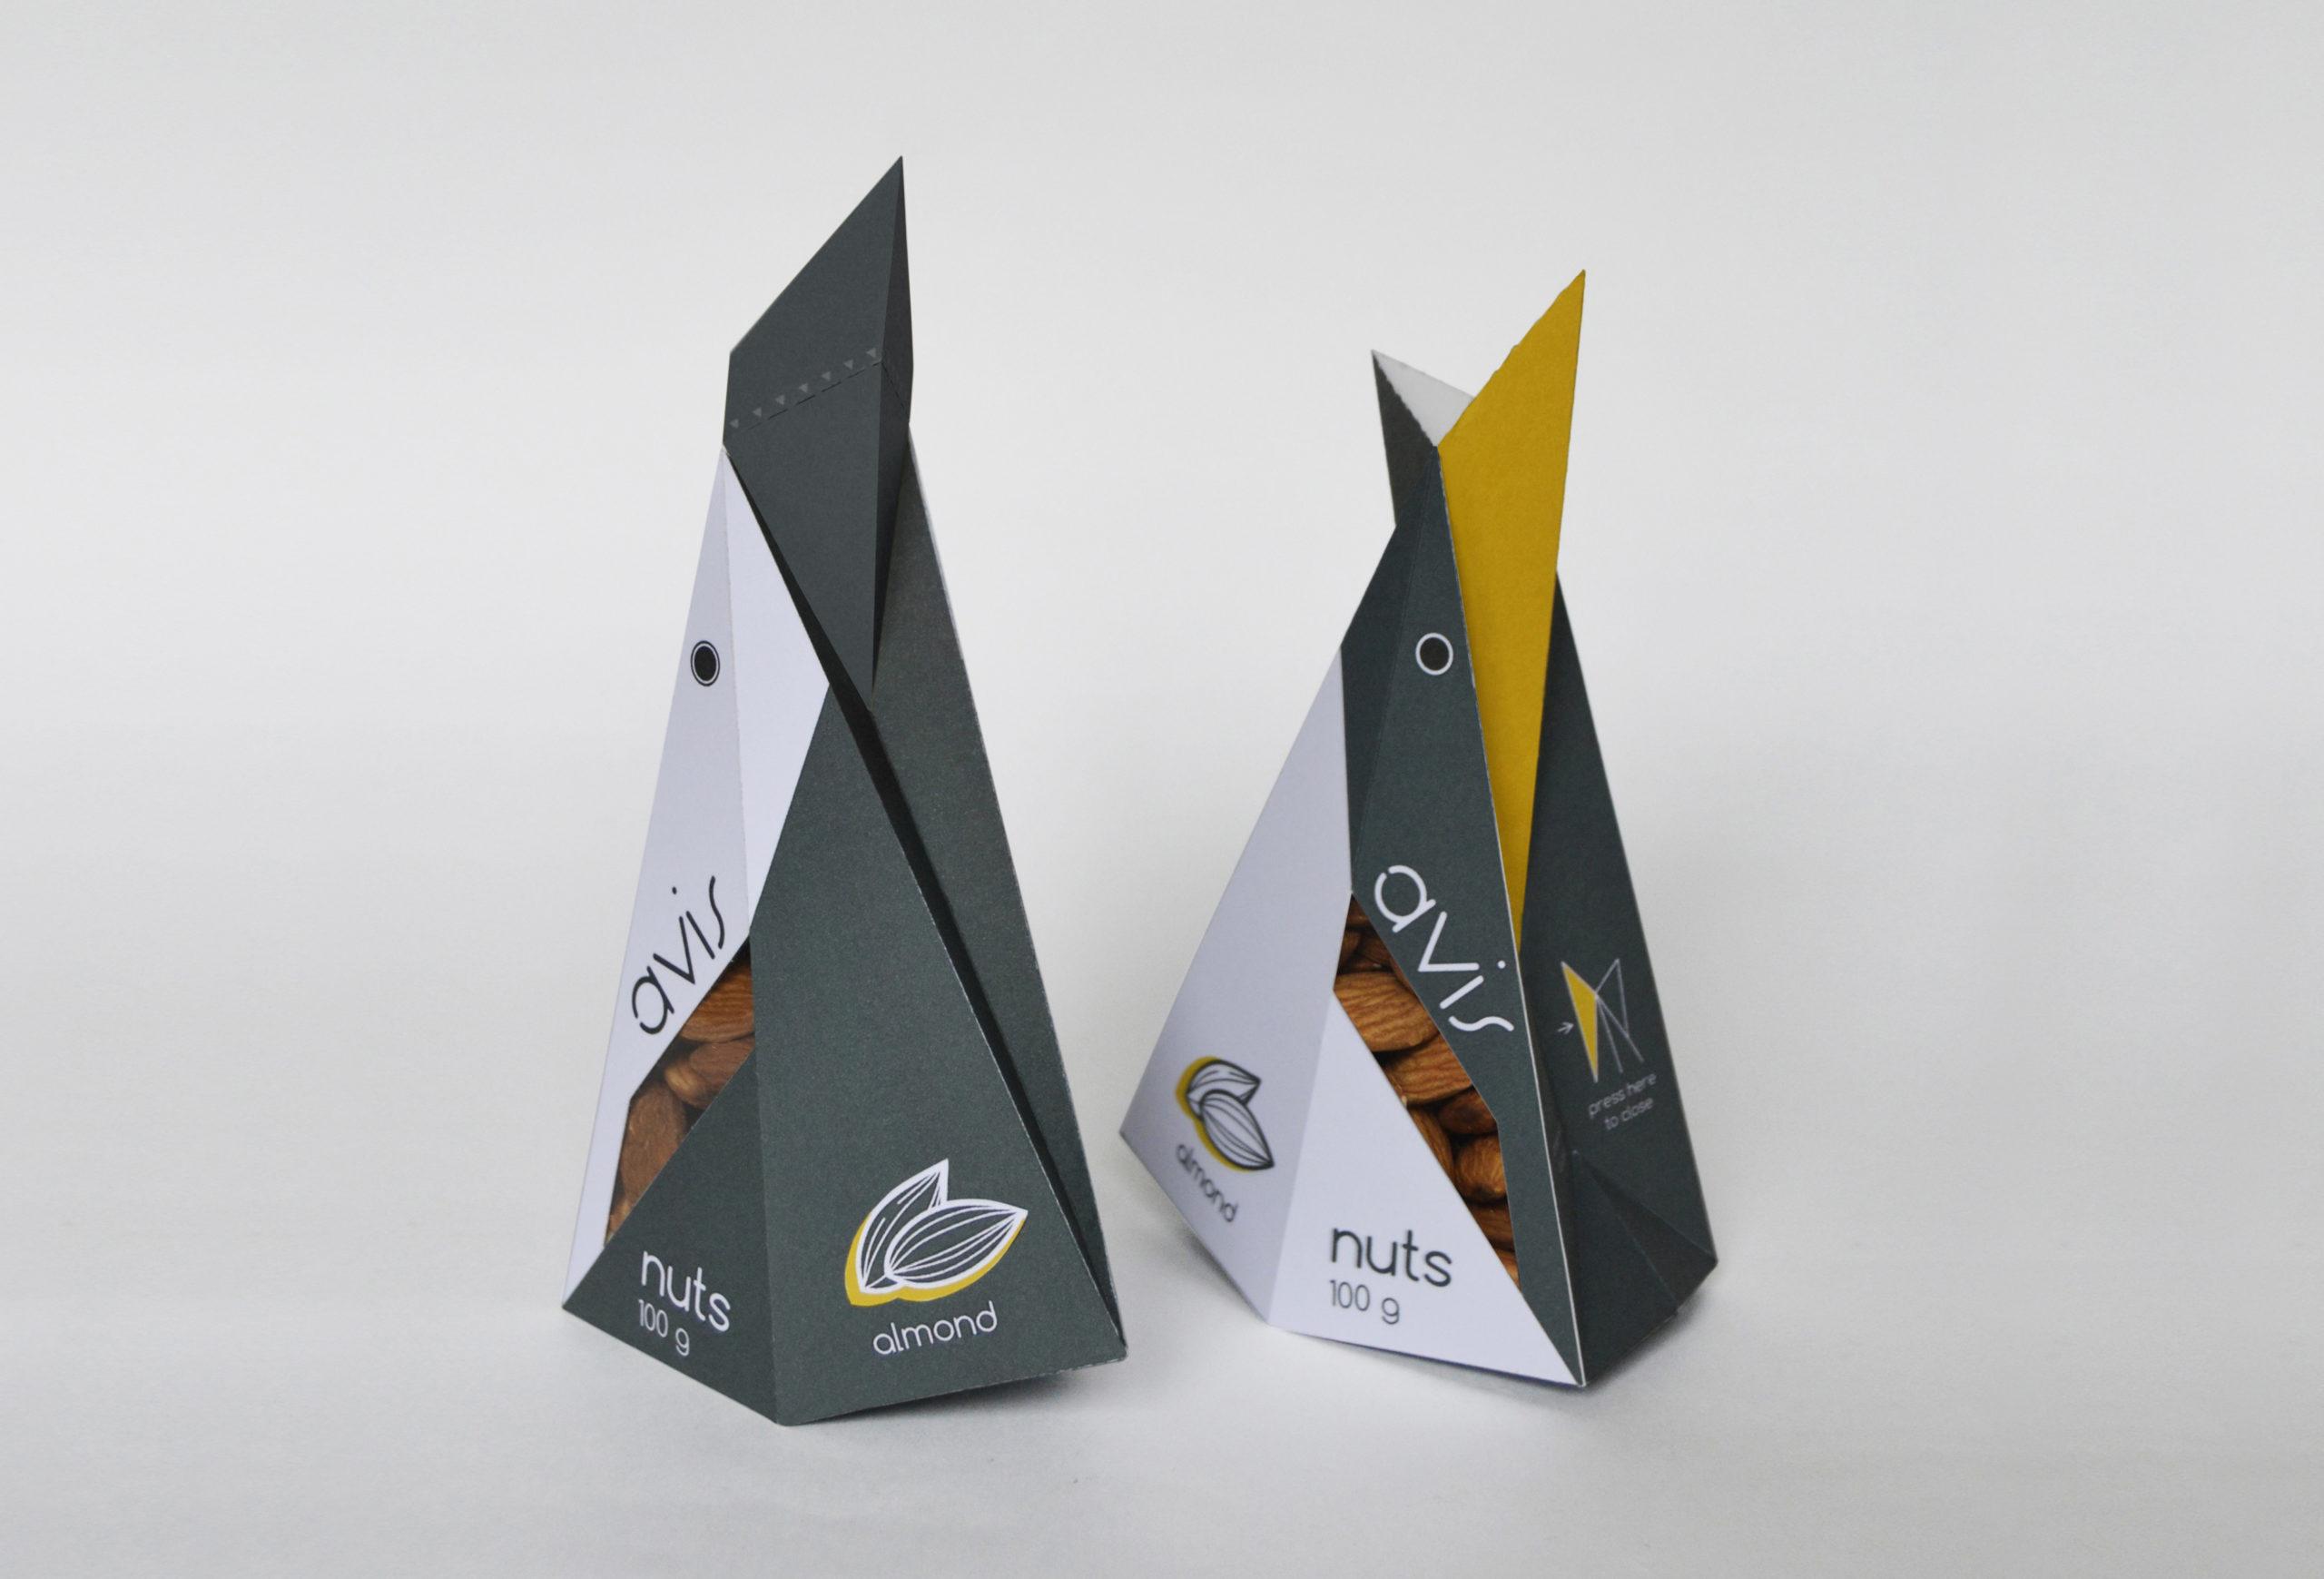 carton-award-image 236237